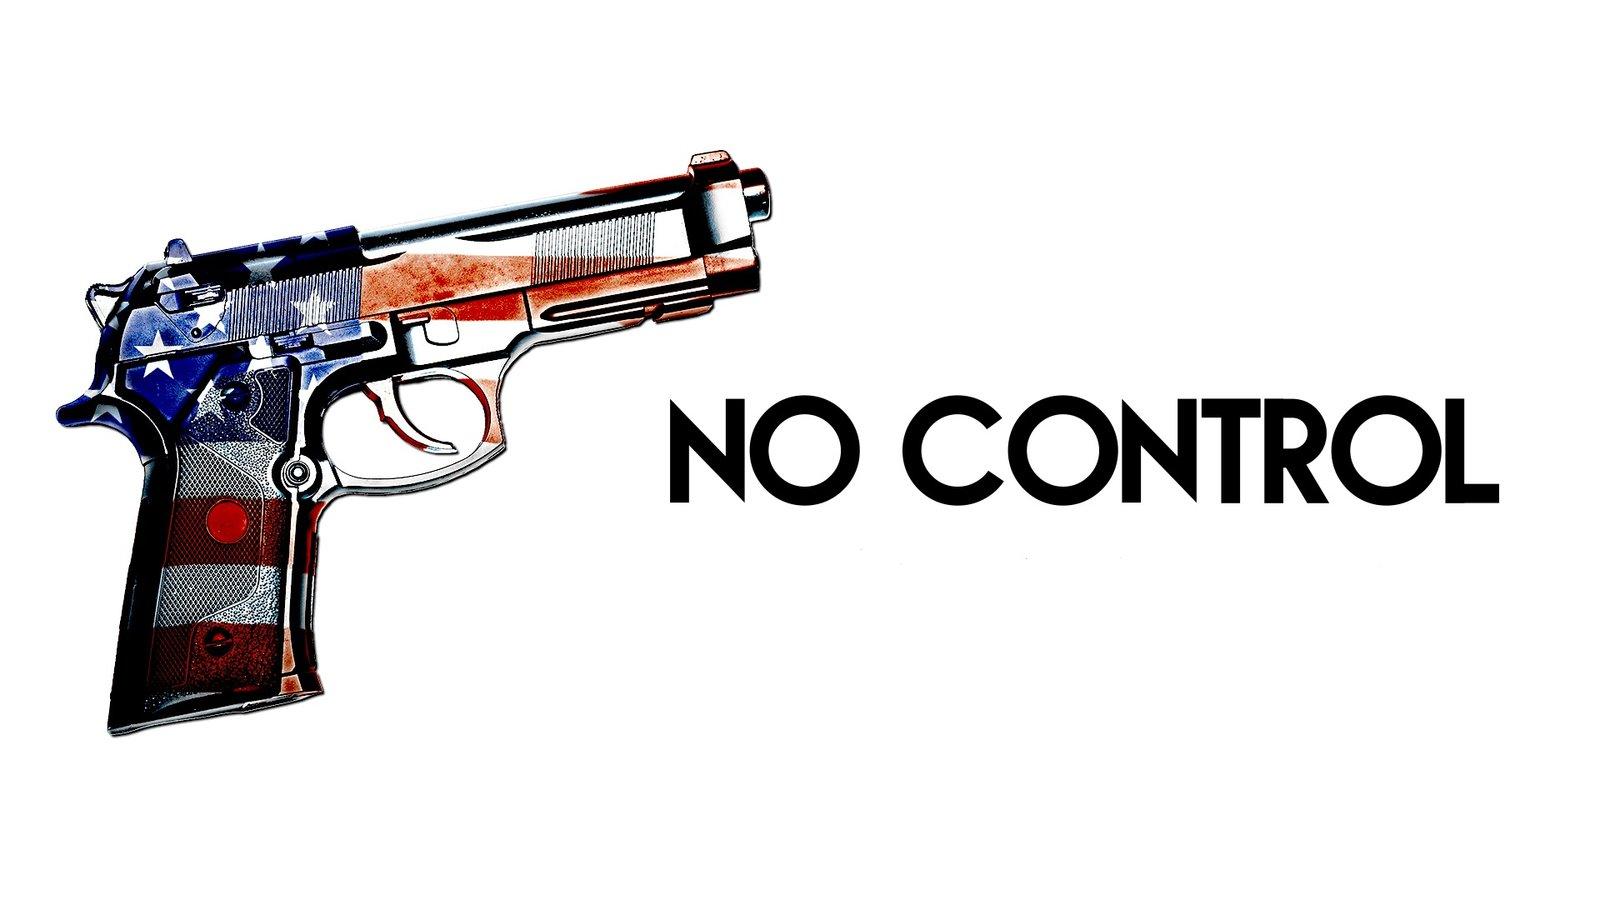 No Control - The Debate Over Gun Control in America